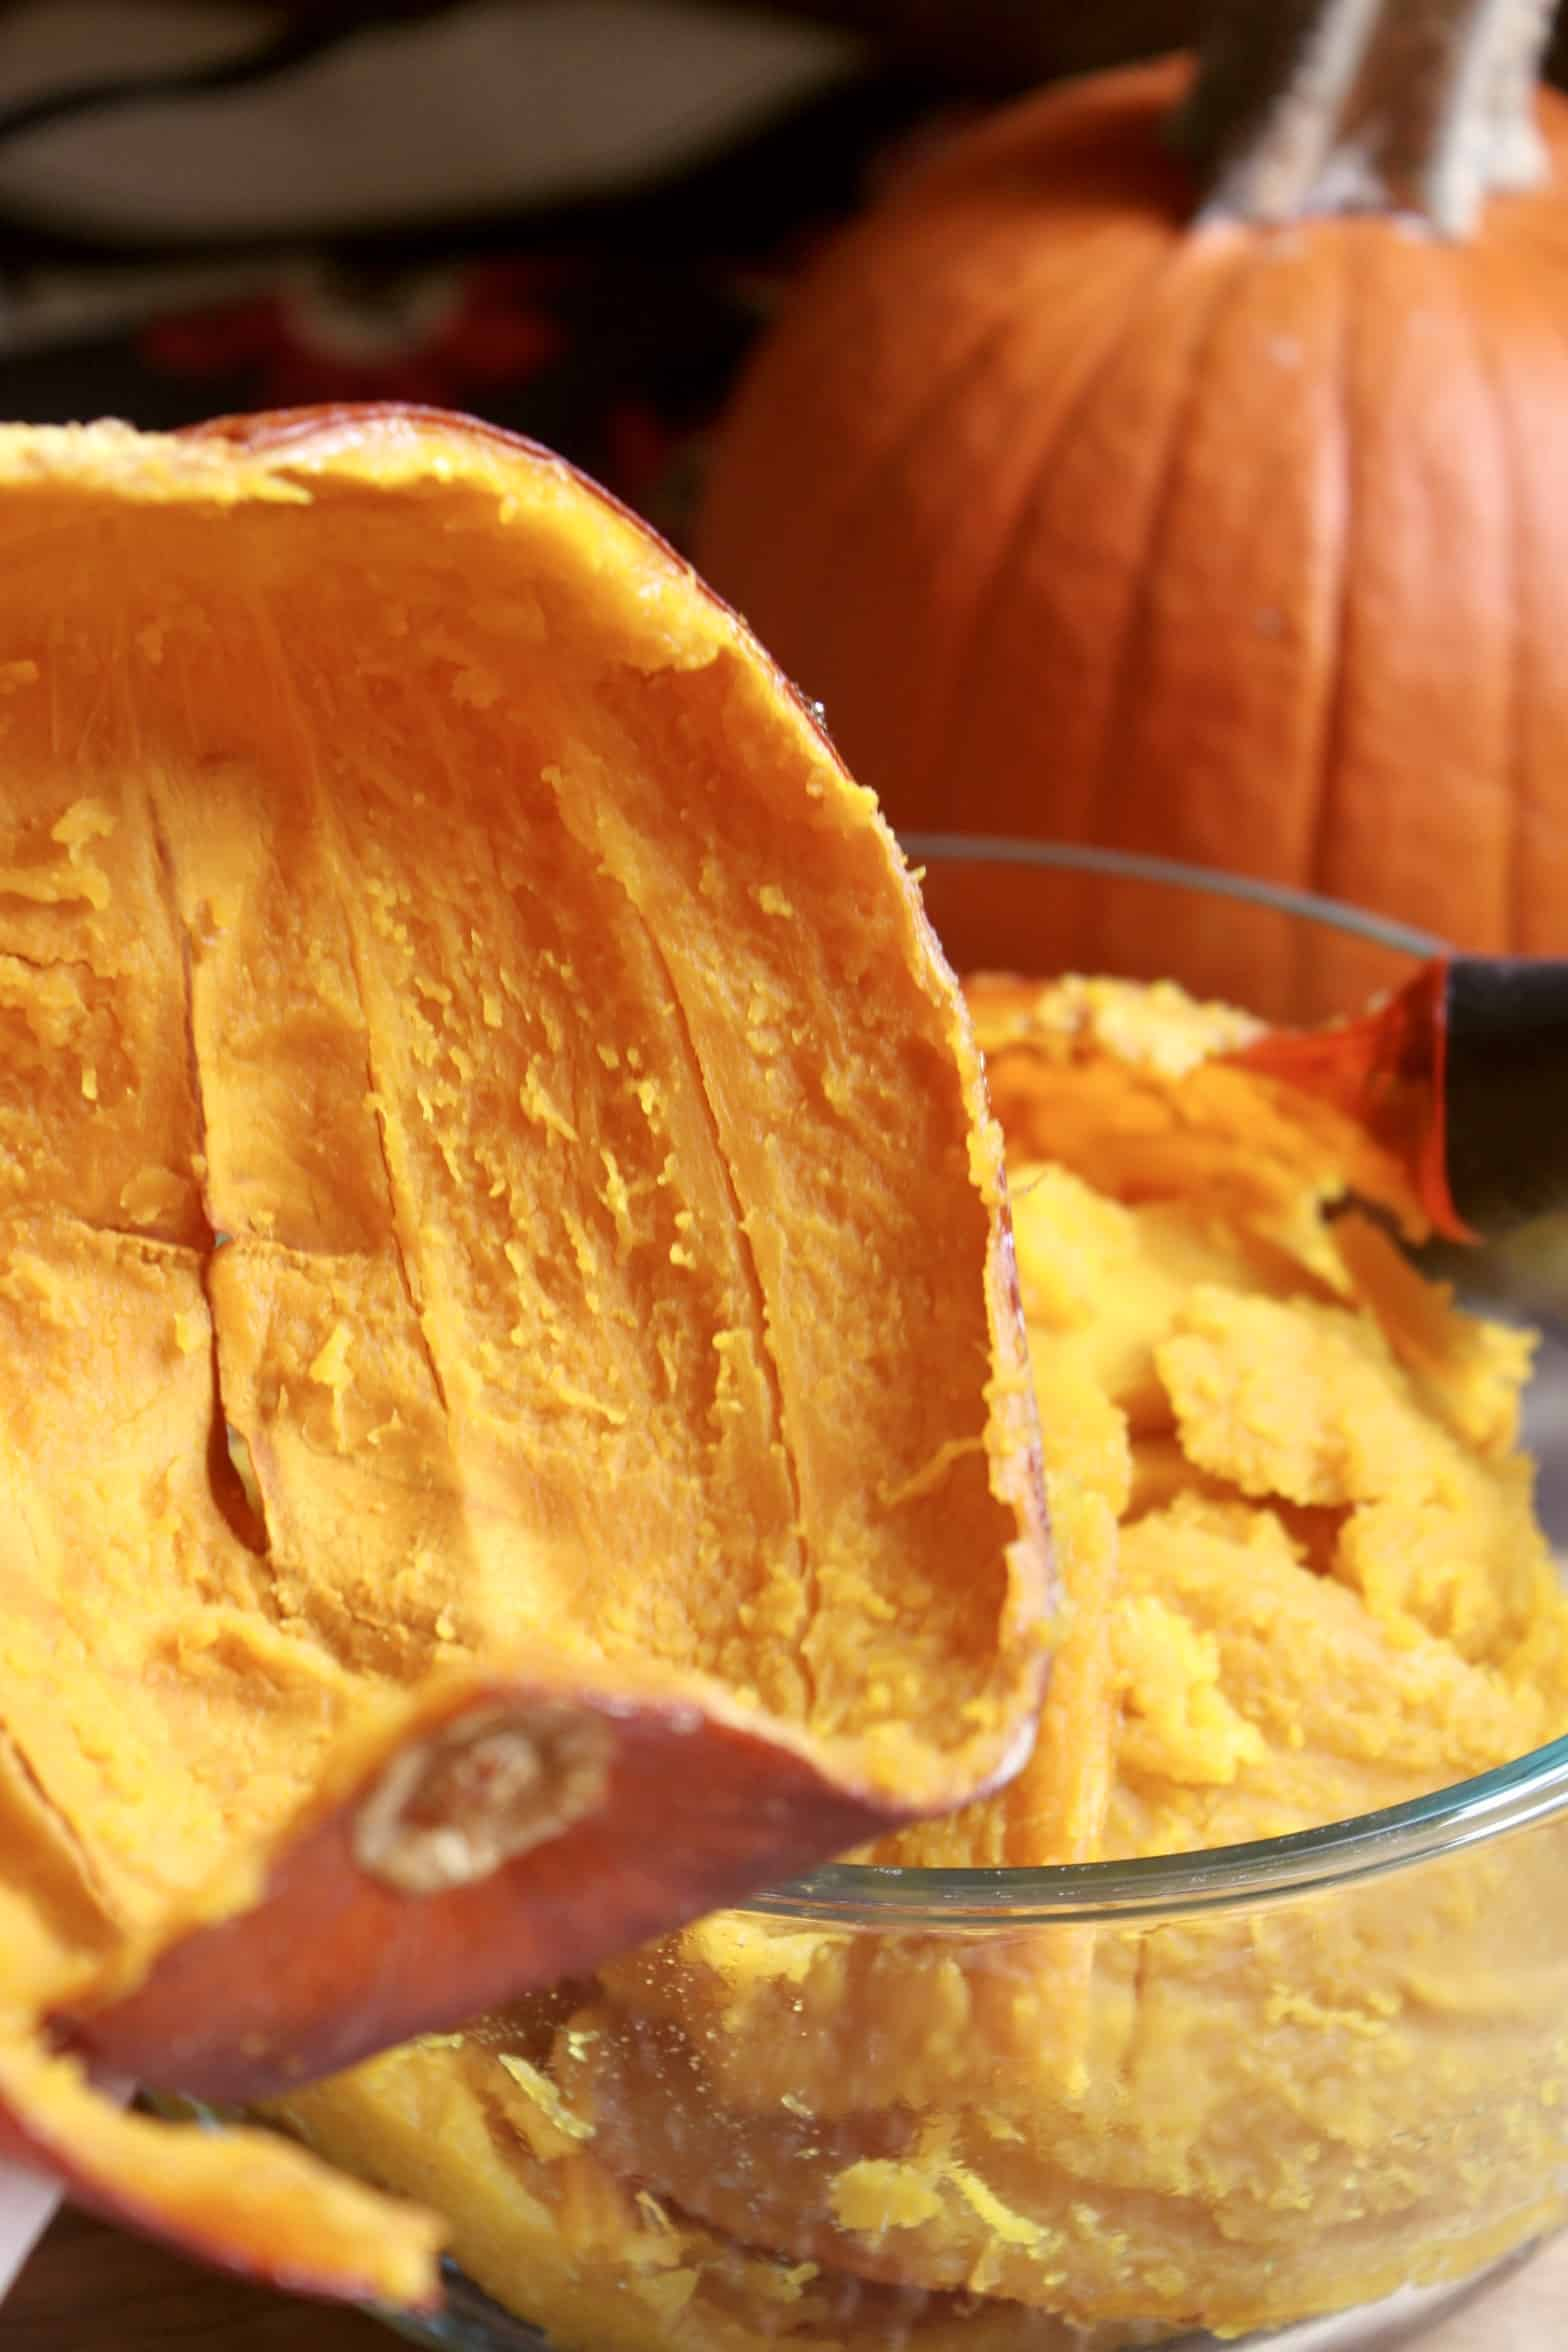 pumpkin shell with pumpkin in background